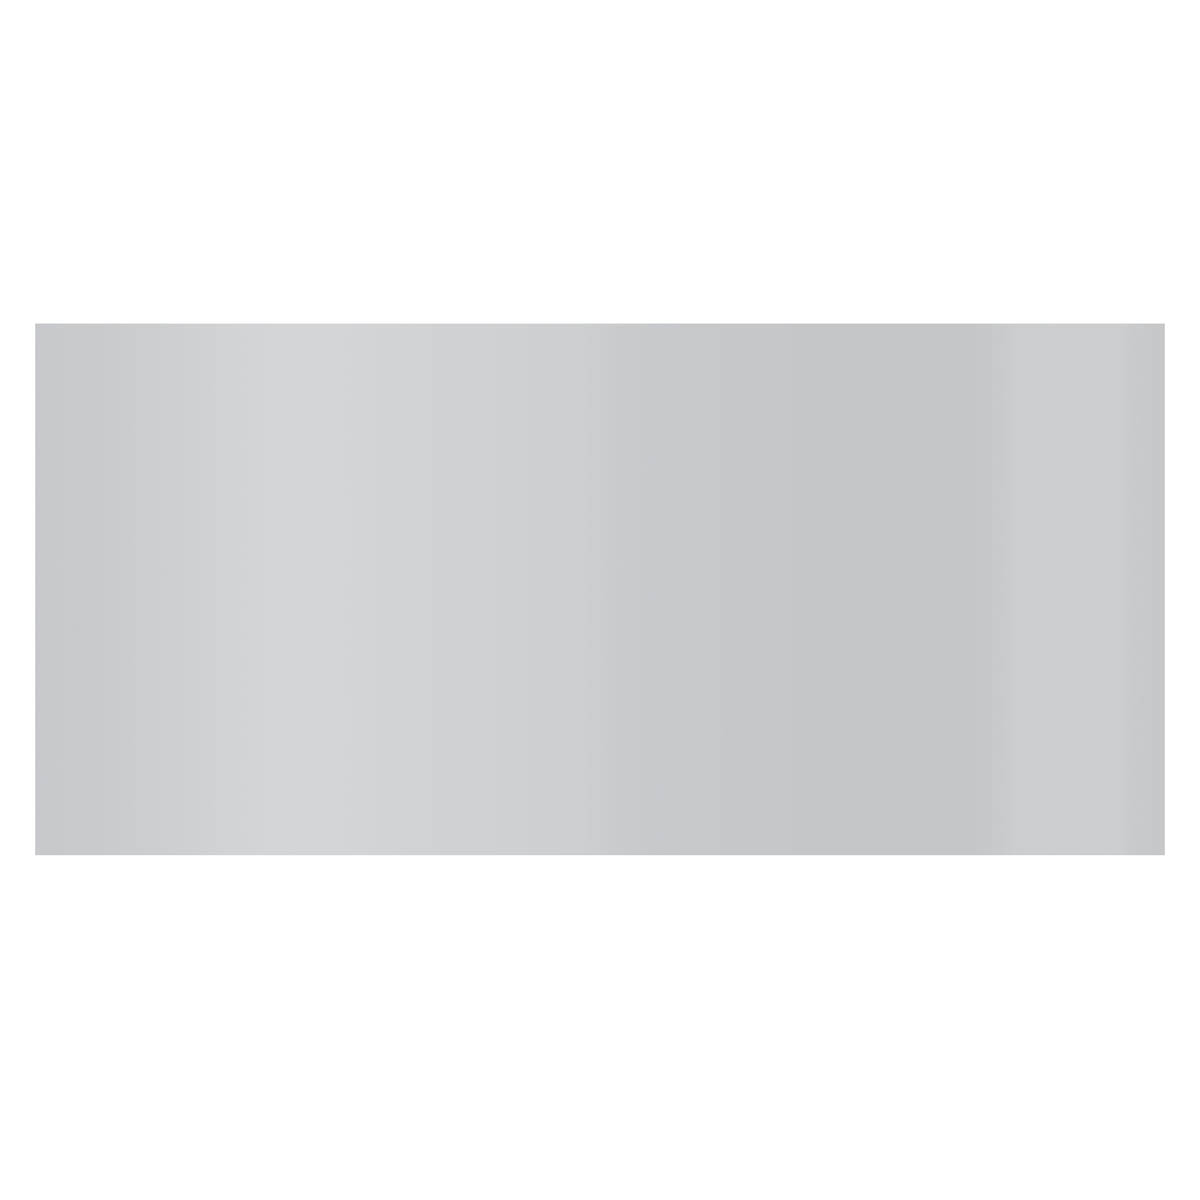 Waverly ® Inspirations Metallic Multi-Surface Acrylic Paint - Silver, 2 oz.